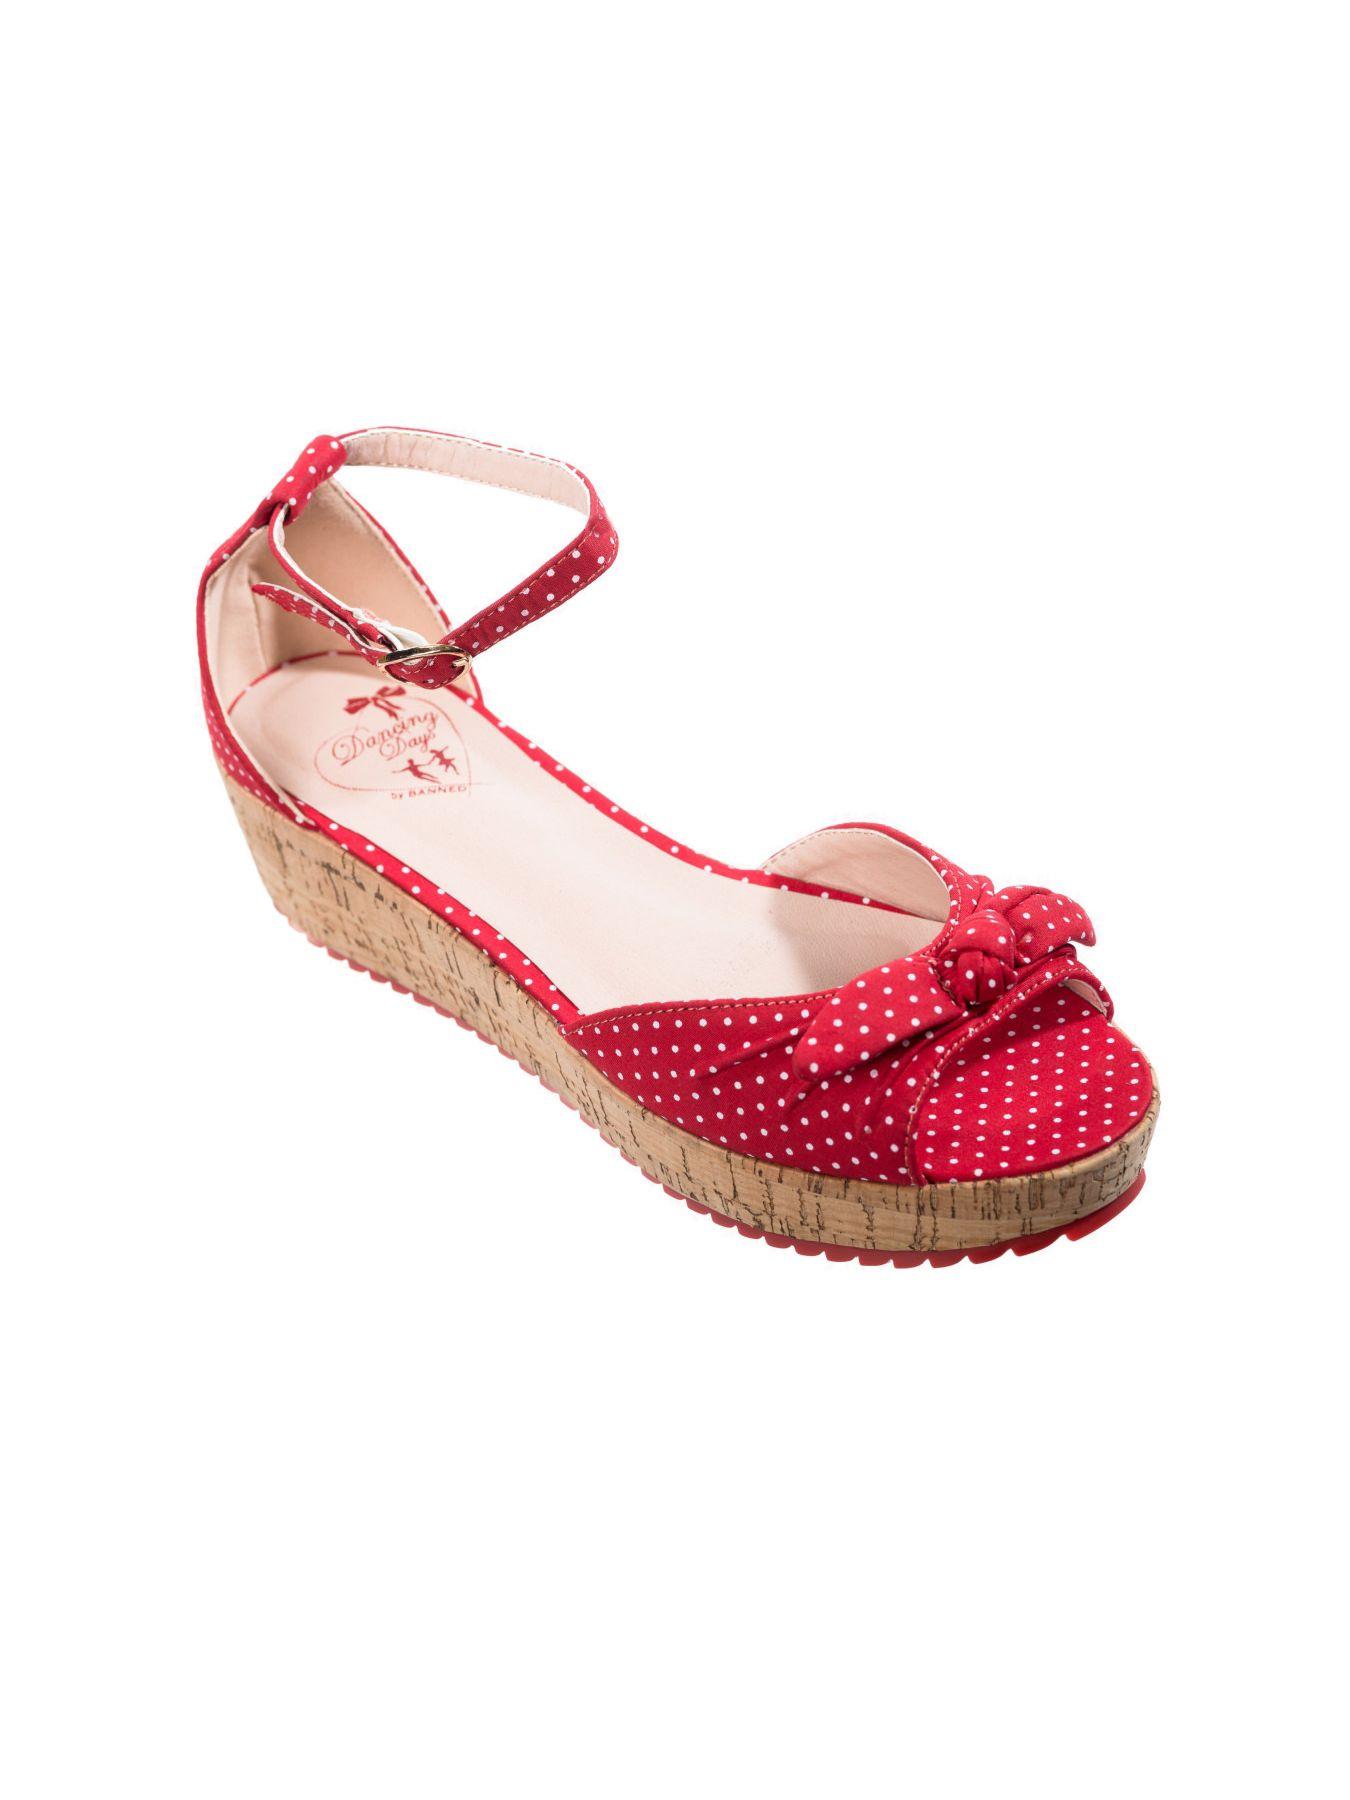 Banned RiRi West 50s Rockabilly Vegan Polka Dot Sandals In Red